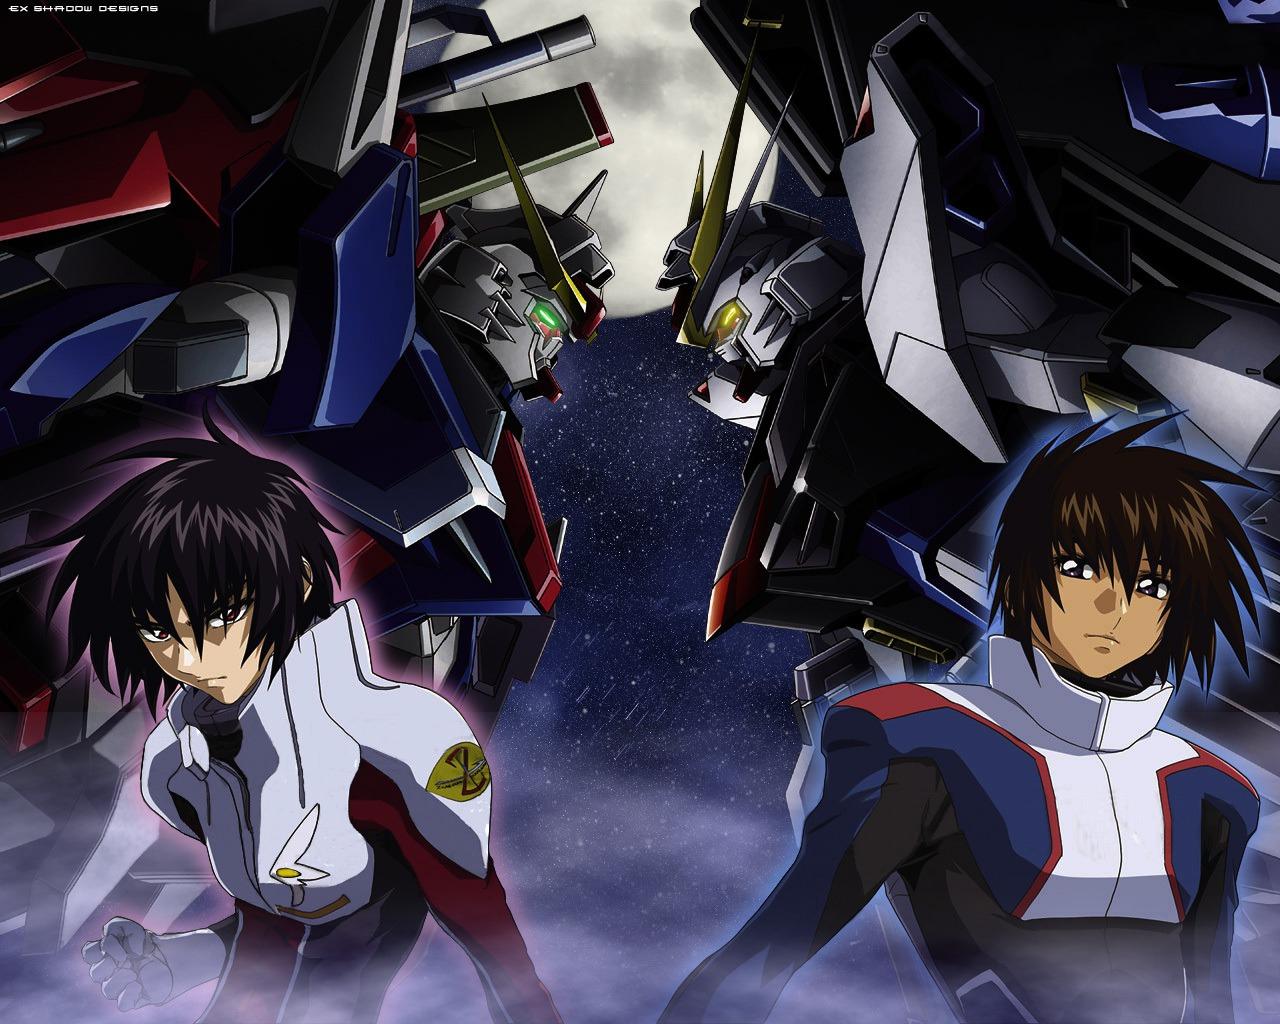 Anime Guys Wallpaper   Anime Guys Wallpaper 28180660 1280x1024